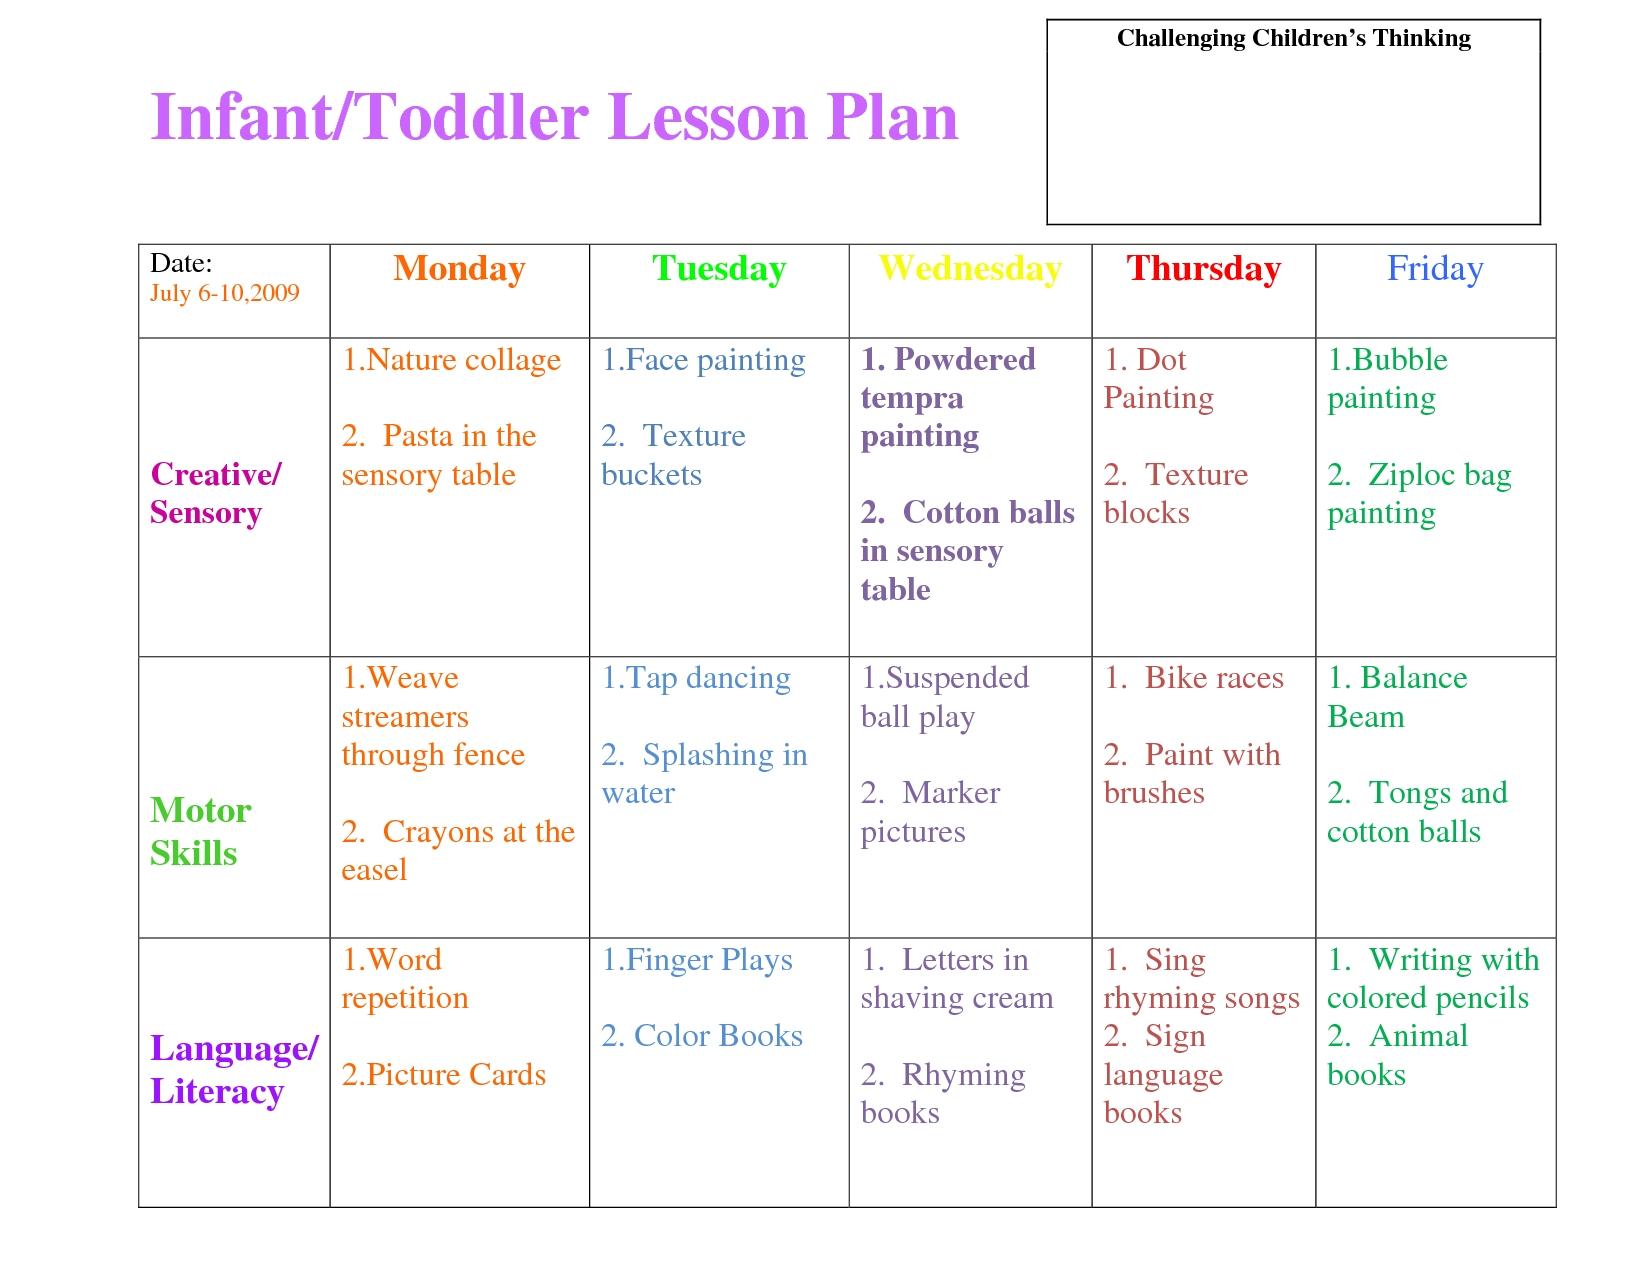 10 Lovely Lesson Plan Ideas For Preschoolers infant blank lesson plan sheets infanttoddler lesson plan lesson 2 2020